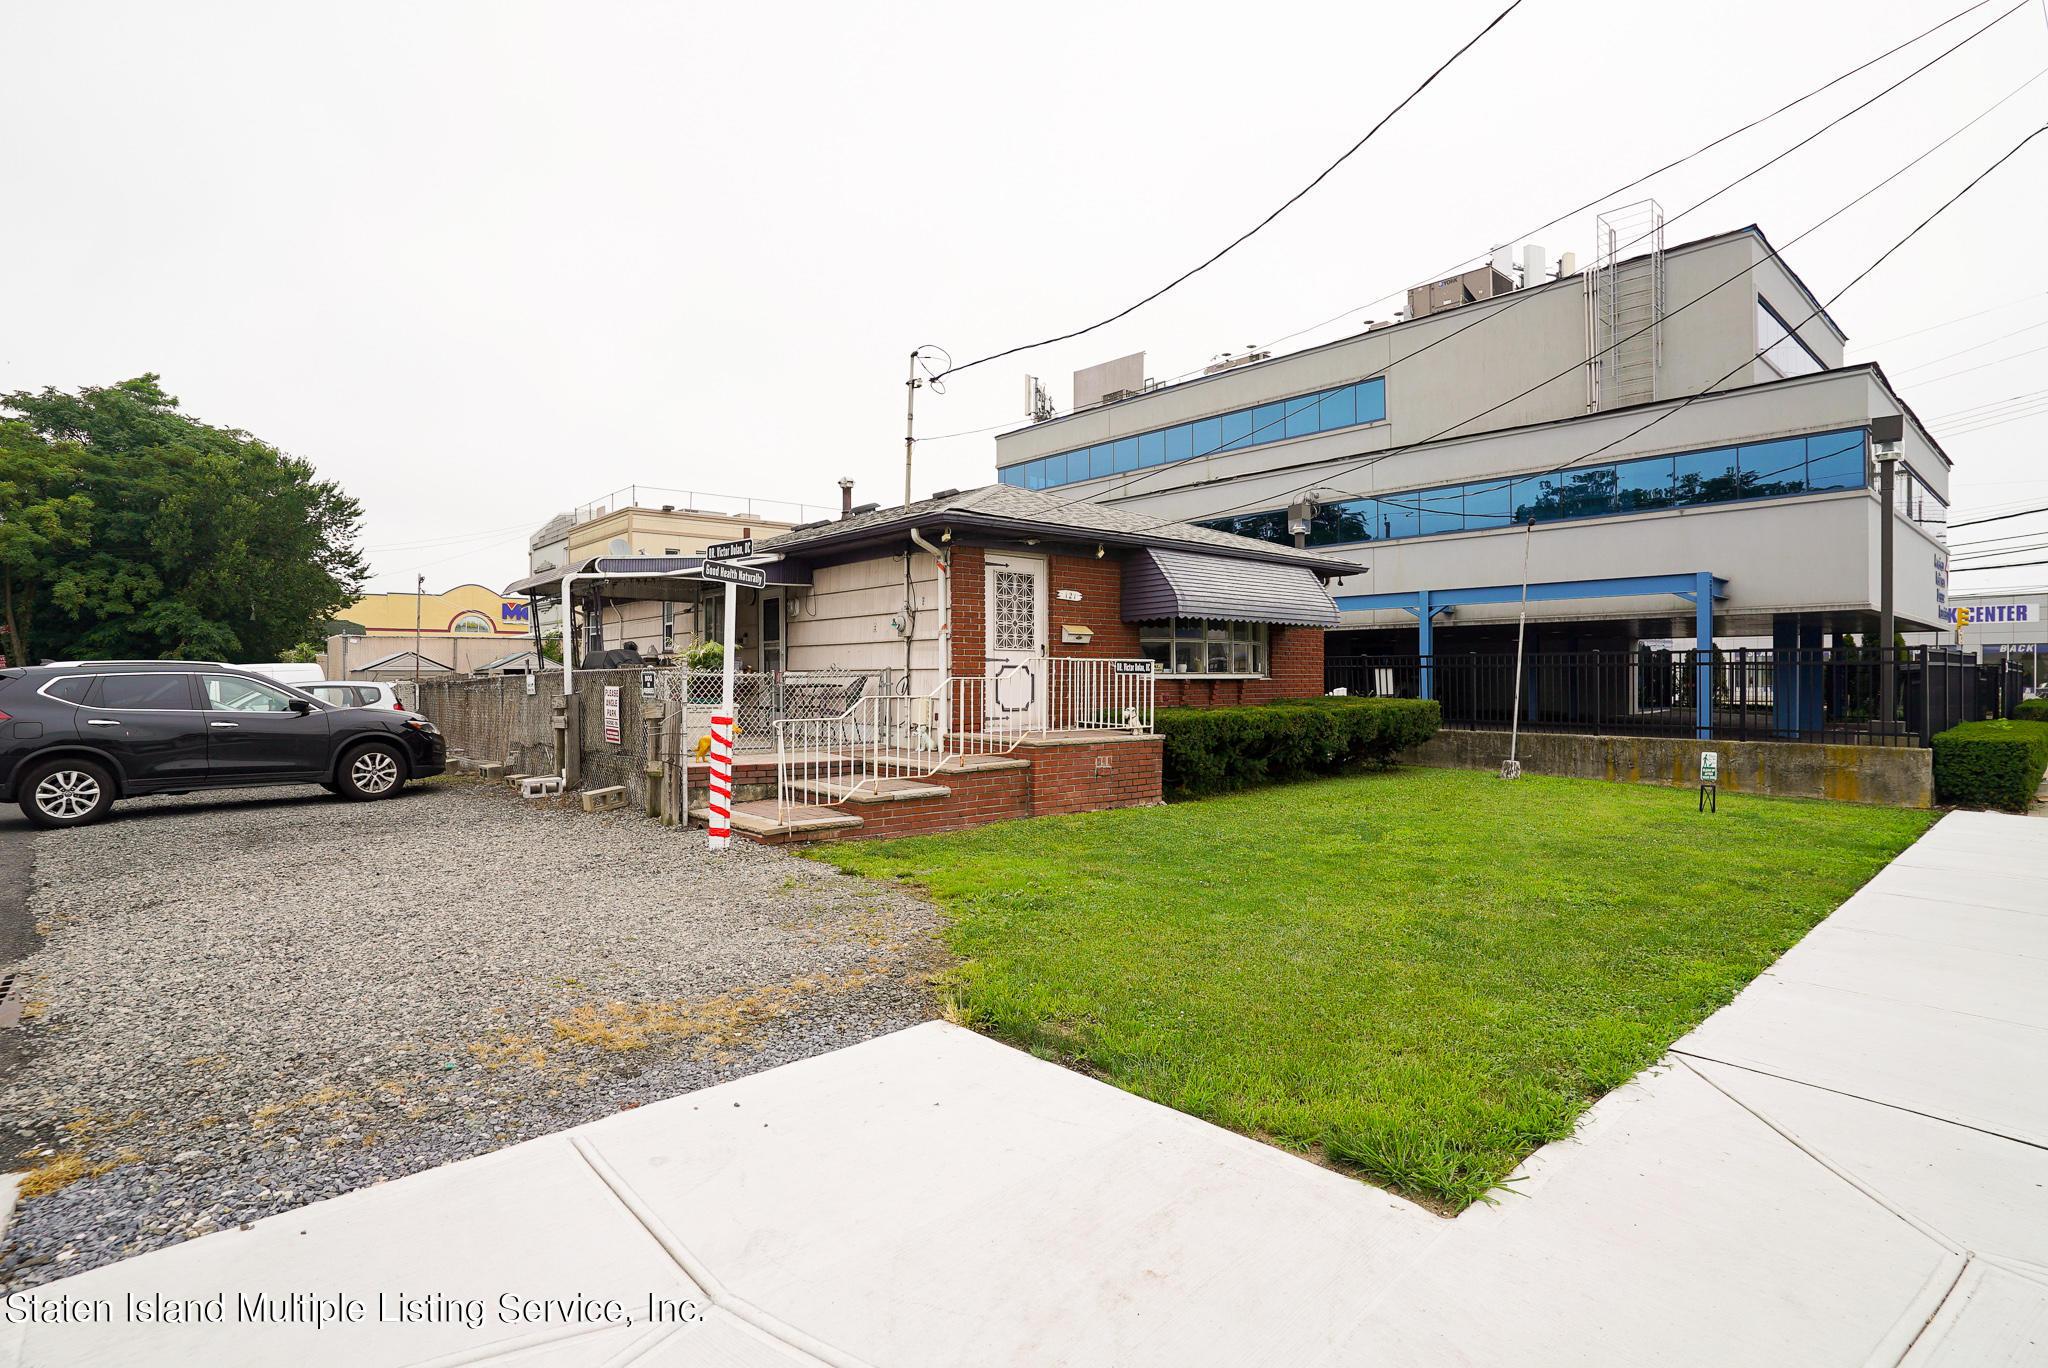 Single Family - Detached 121 Parkinson Avenue  Staten Island, NY 10305, MLS-1147747-5